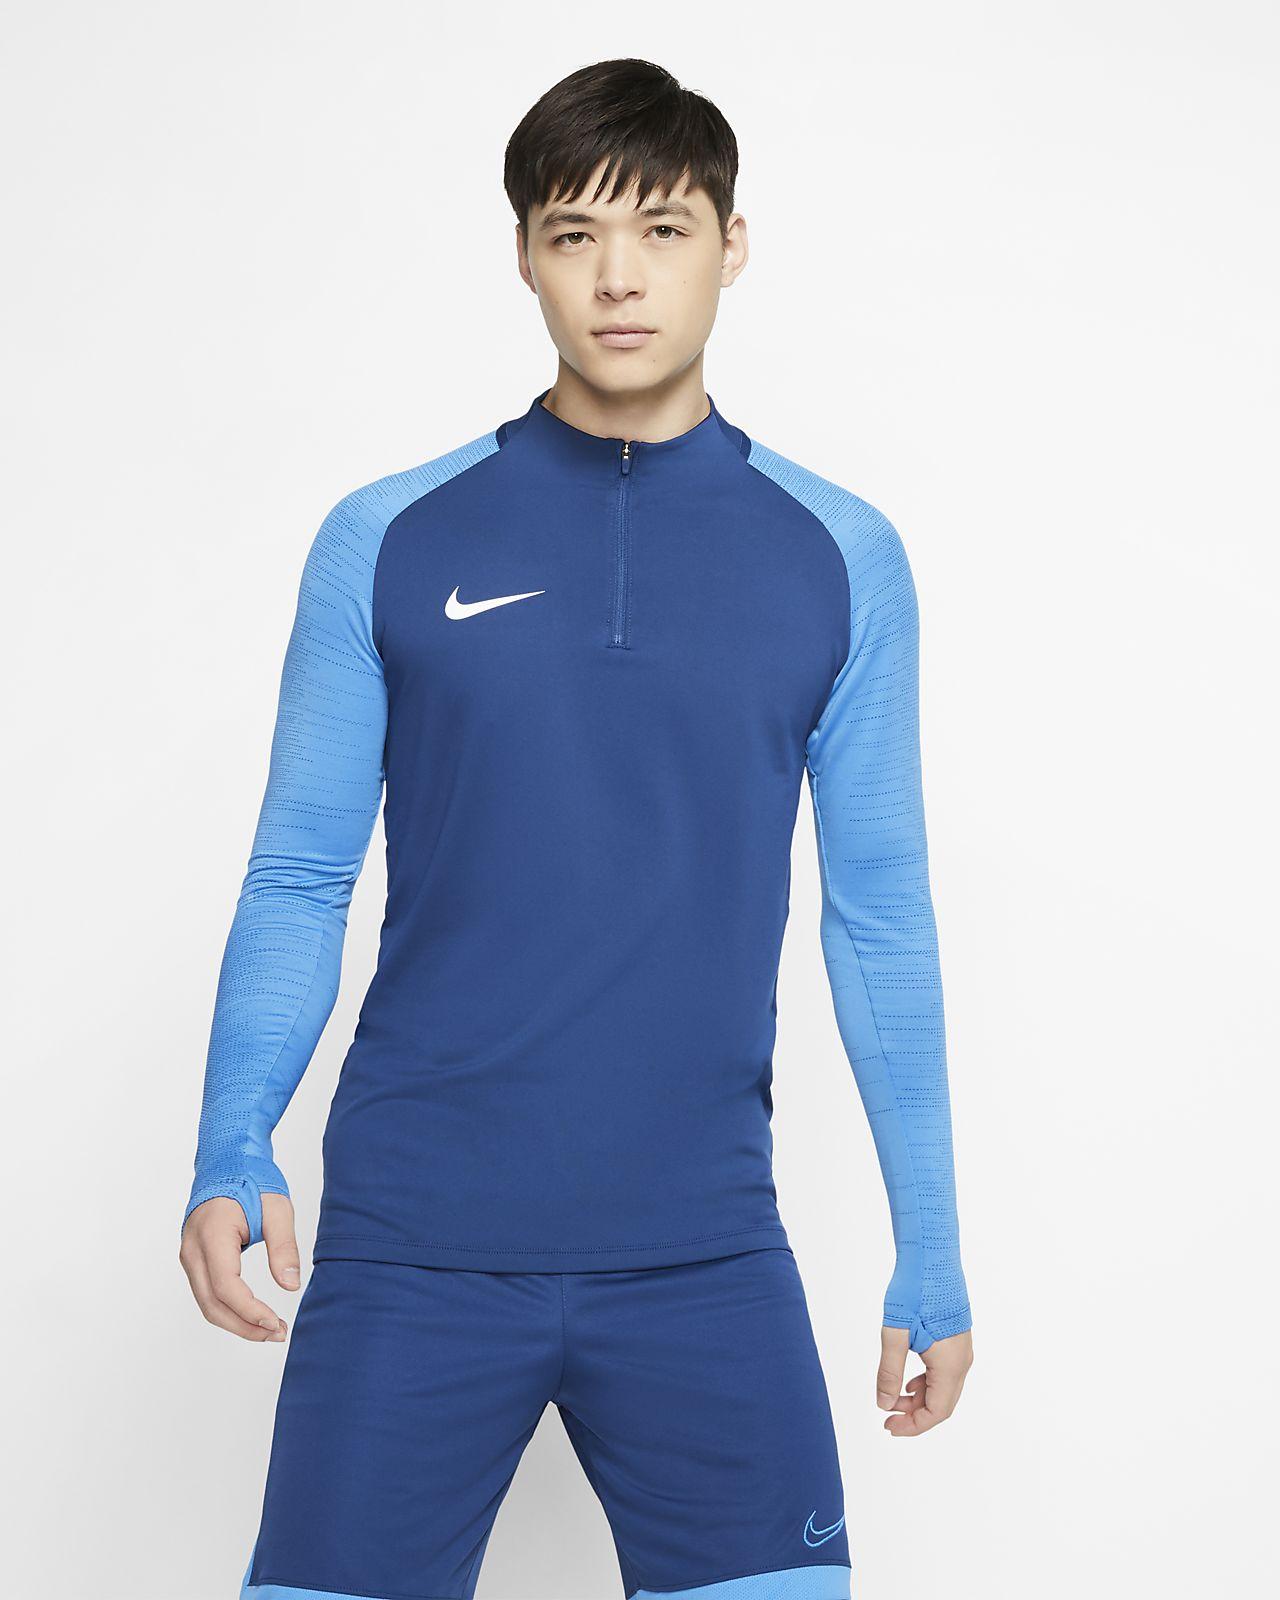 Nike Dri-FIT Strike Men's Soccer Drill Top